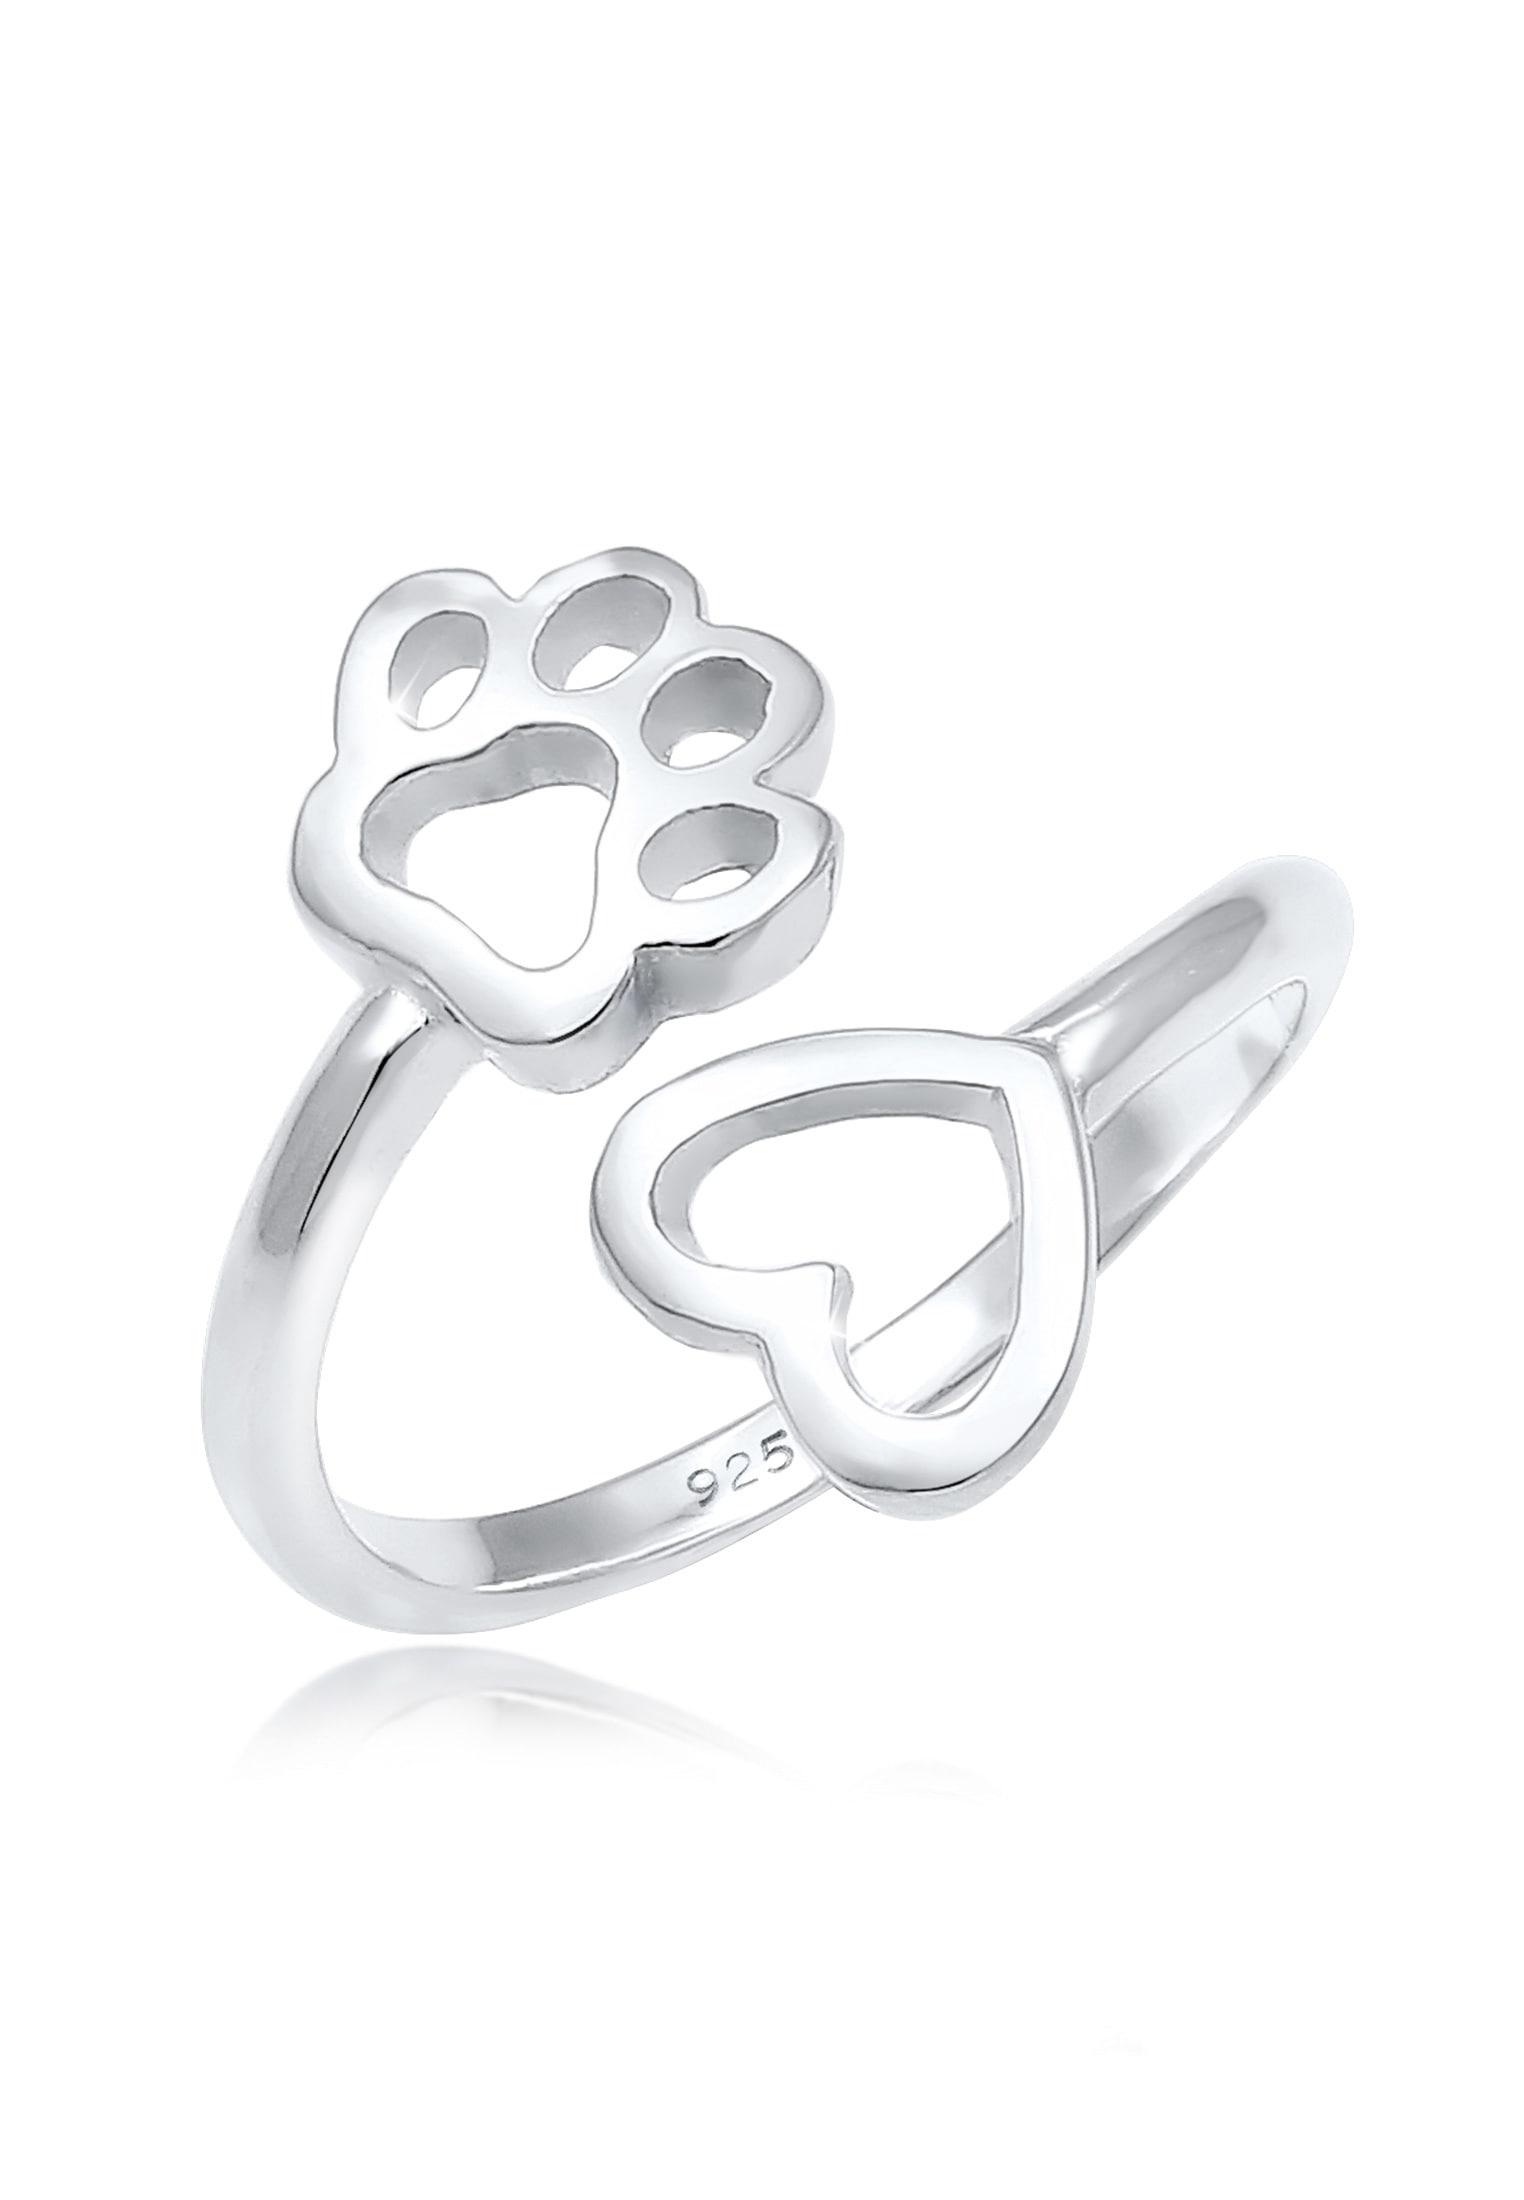 Nenalina Fingerring Herz Pfote Tierliebe Offen Verstellbar 925 Silber | Schmuck > Ringe > Fingerringe | Nenalina